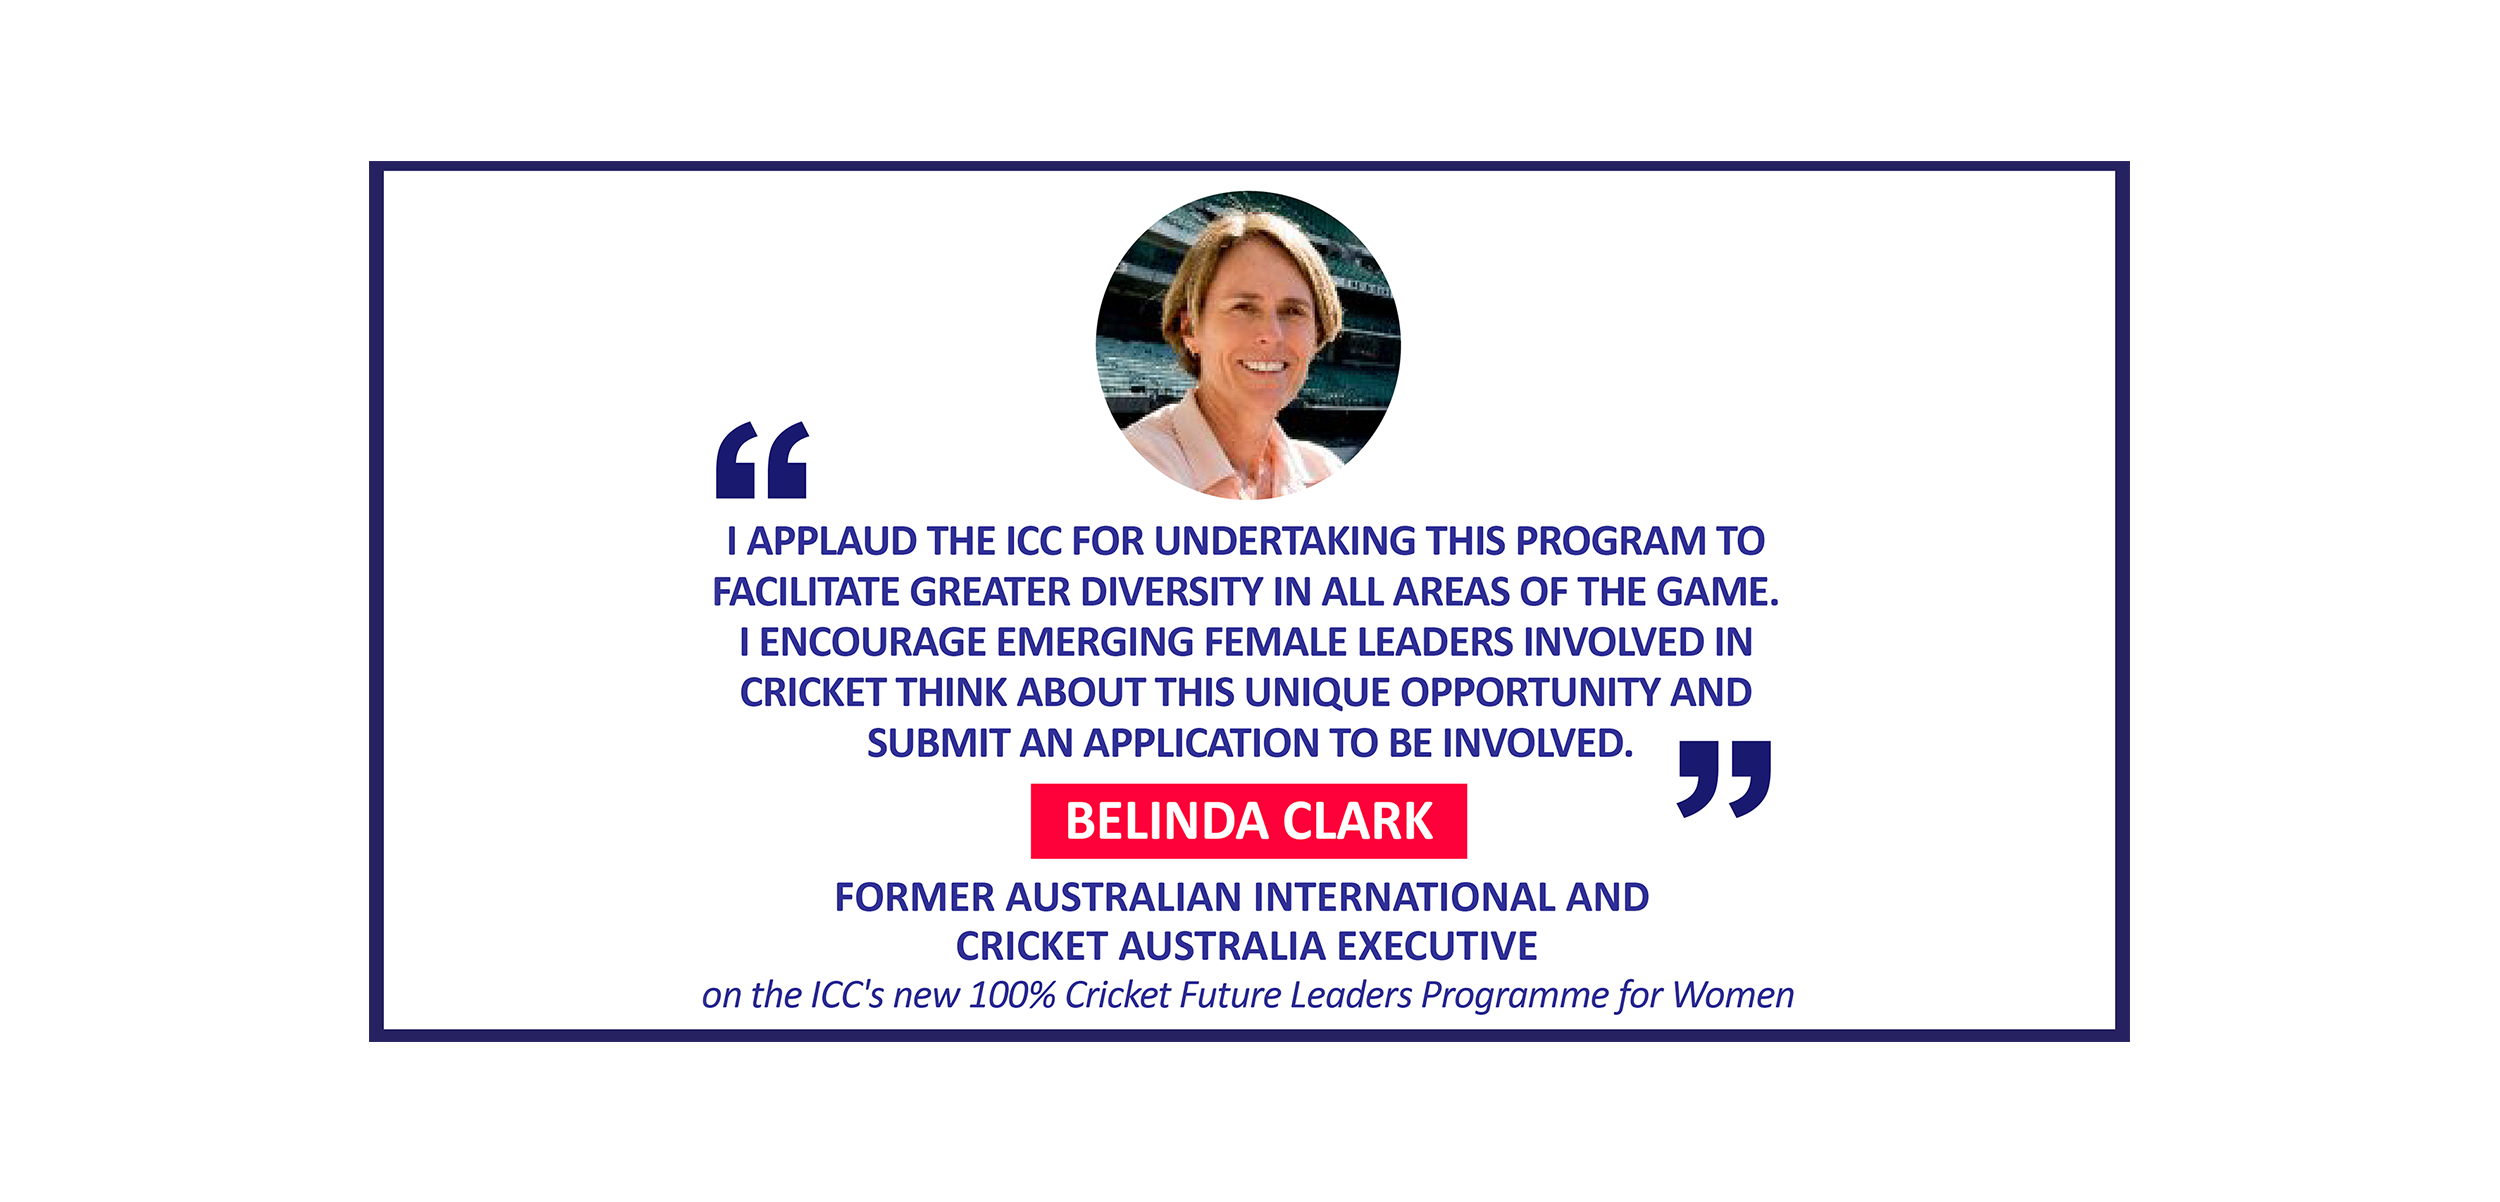 Belinda Clark, former Australian International and Cricket Australia executive on the ICC's new 100% Cricket Future Leaders Programme for Women